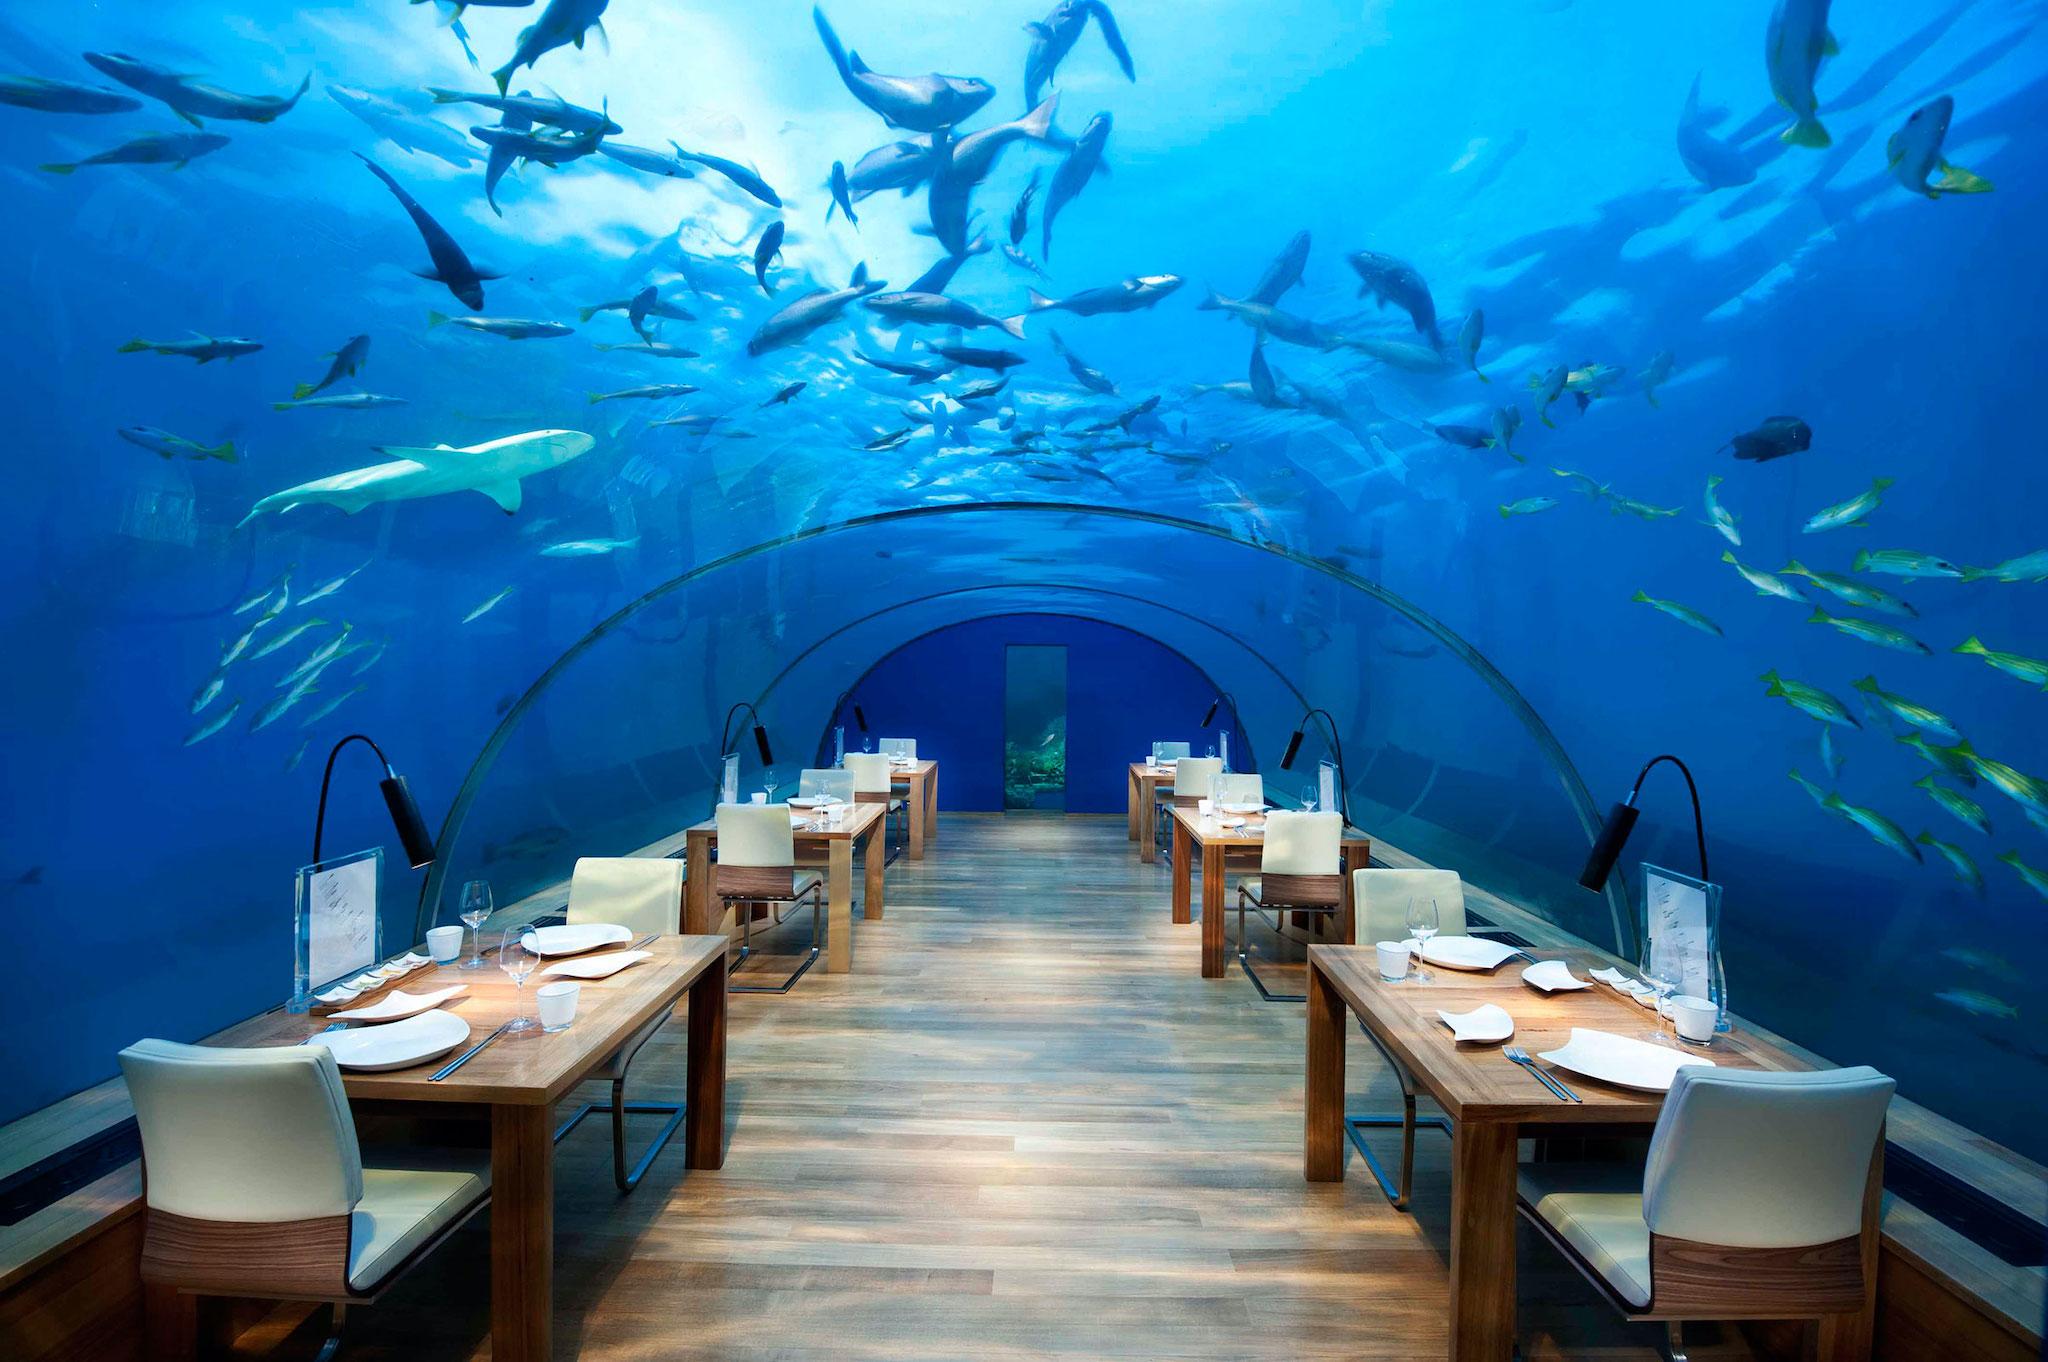 conrad_maldives_6.jpg